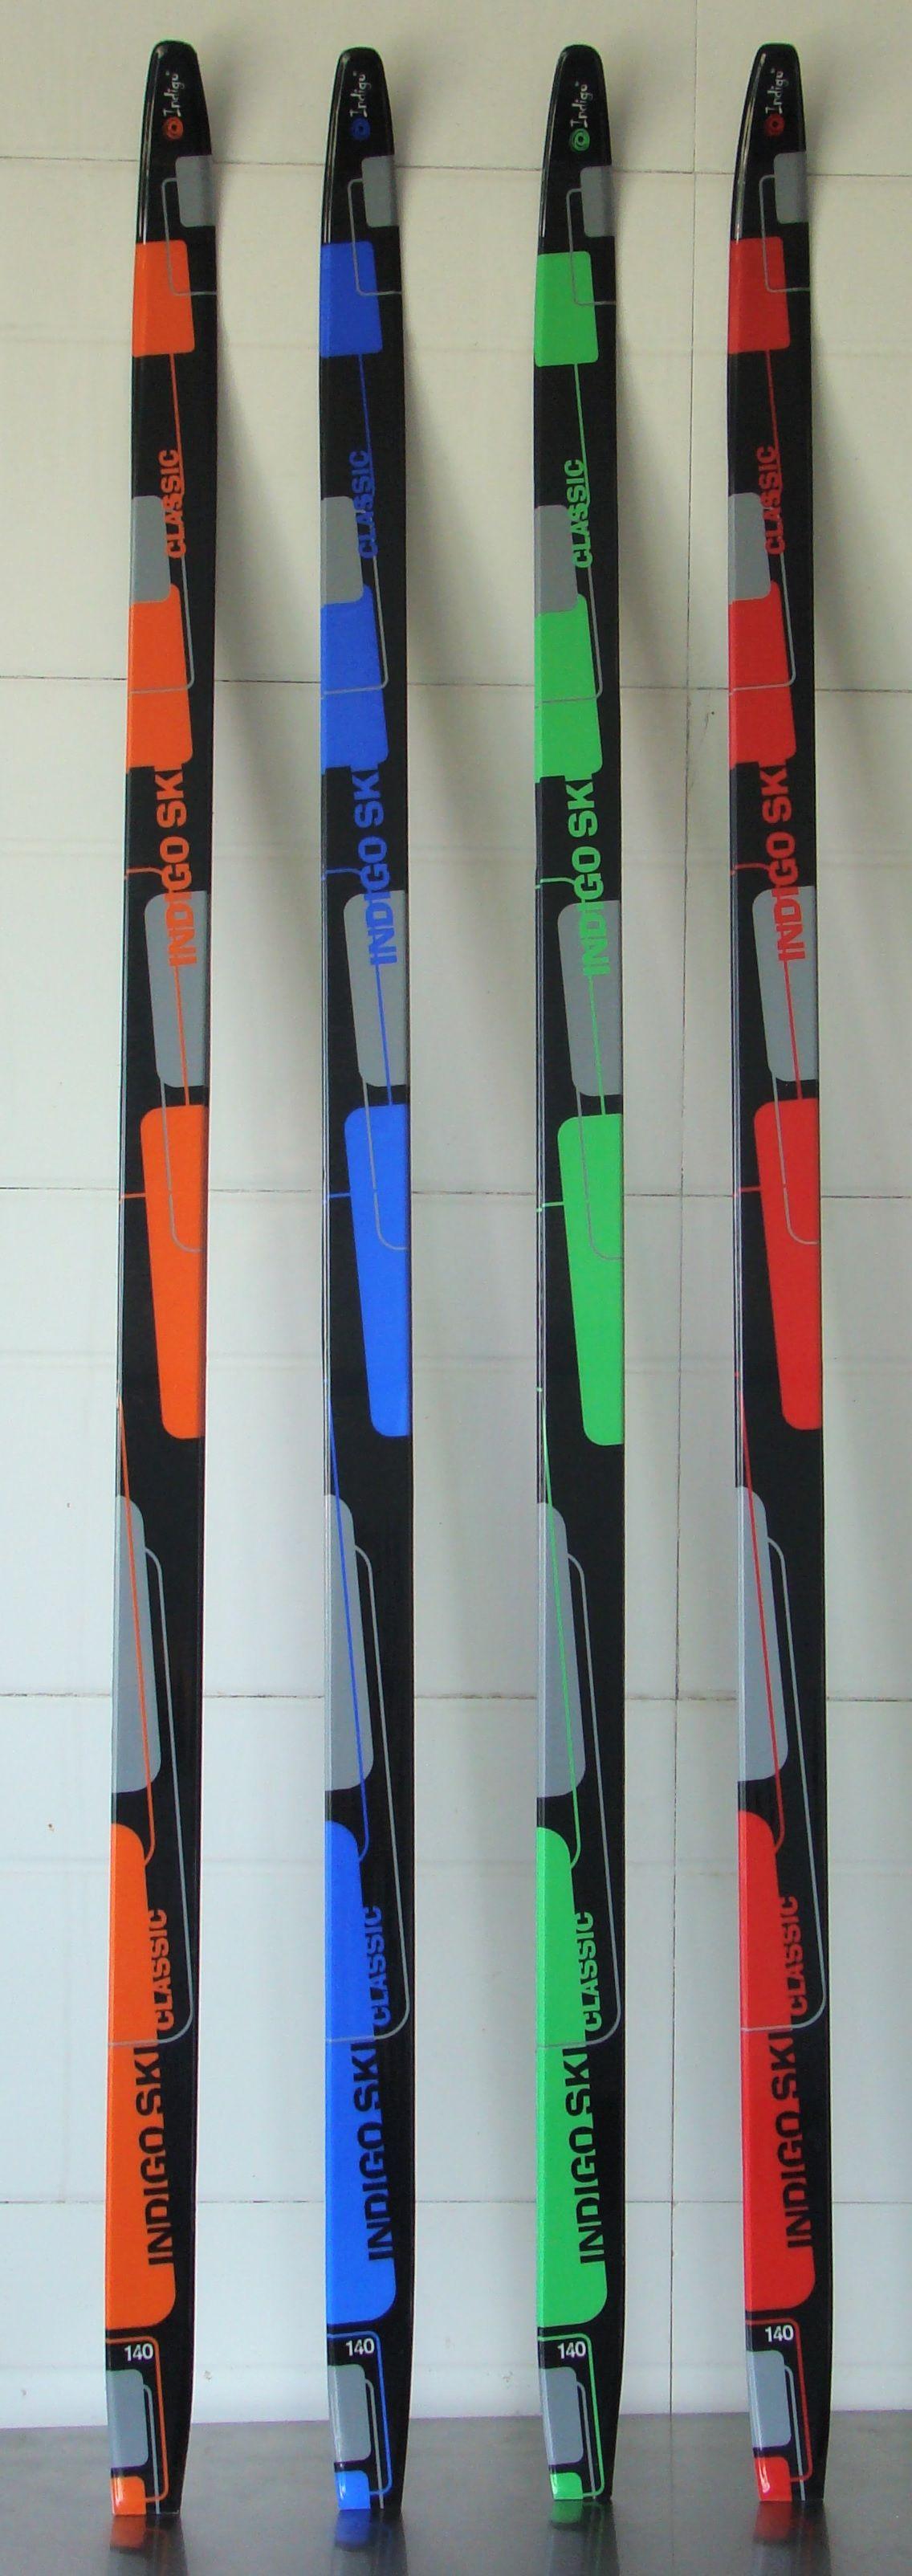 Лыжи п/пл INDIGO CLASSIC 200см цв. ЗеленыйЛыжи, палки, крепления<br><br><br>Артикул: 00018781<br>Бренд: INDIGO